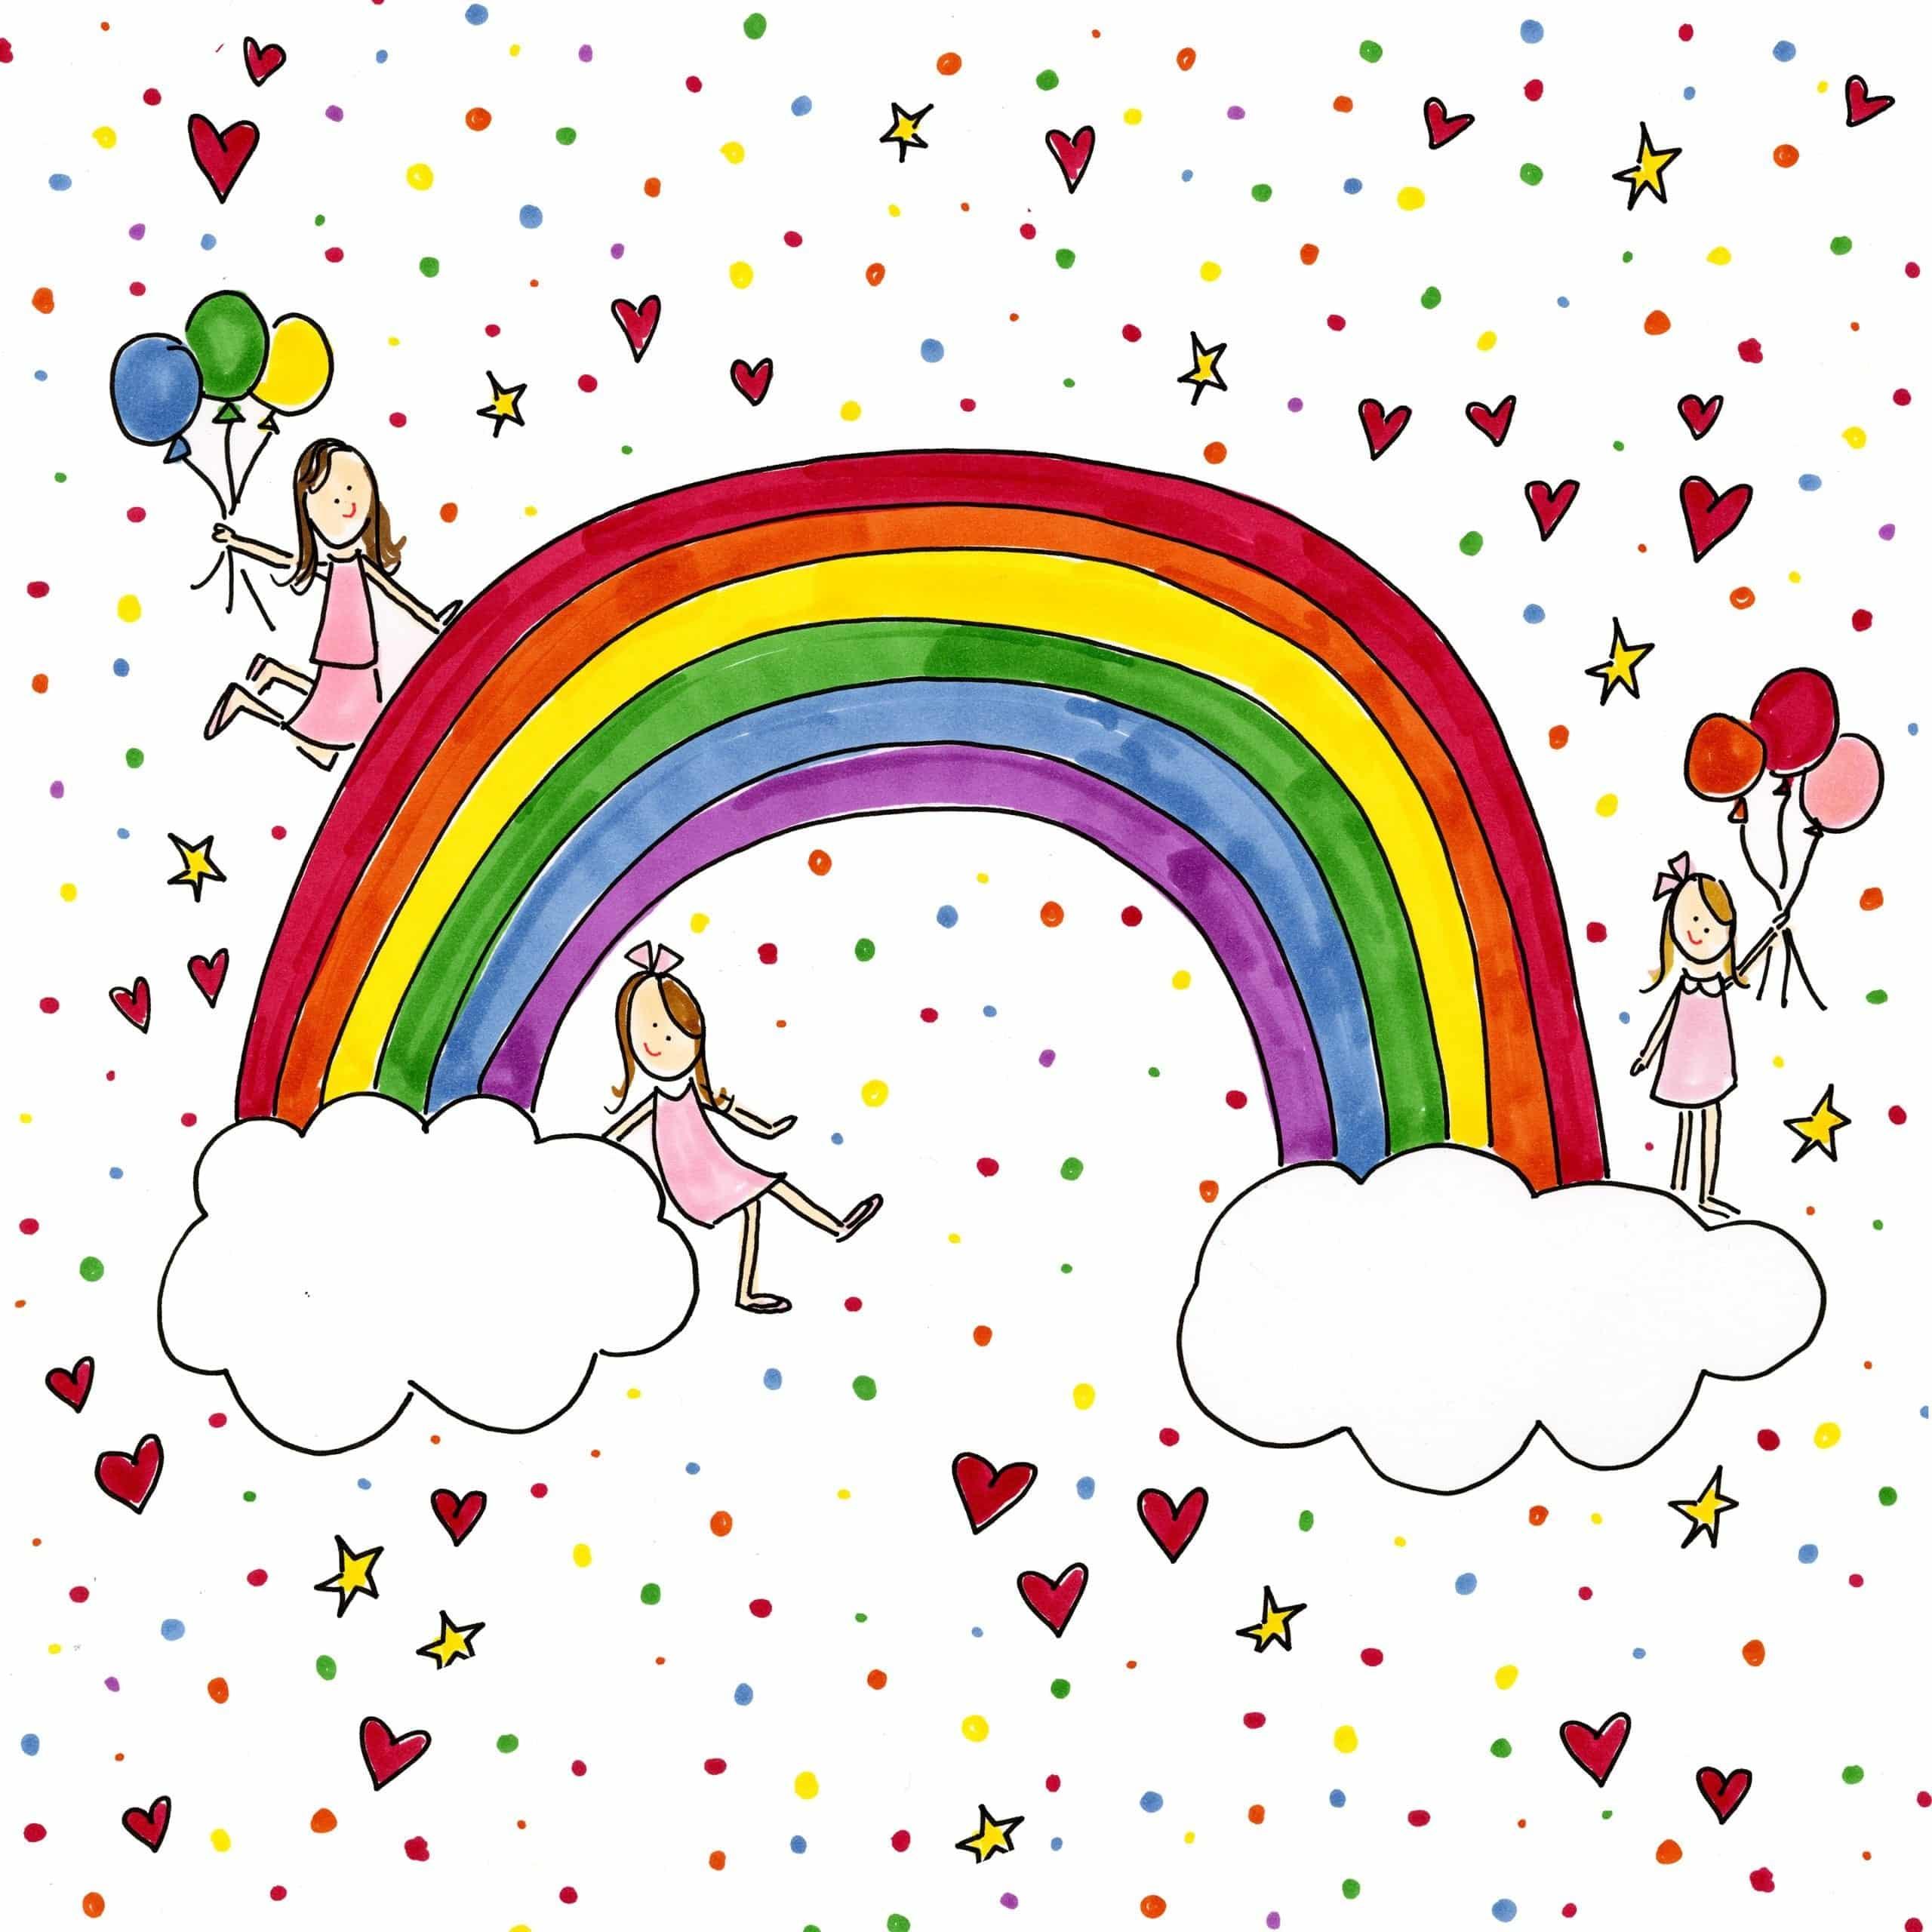 Rainbow Coloring Page Darcy Miller Designs